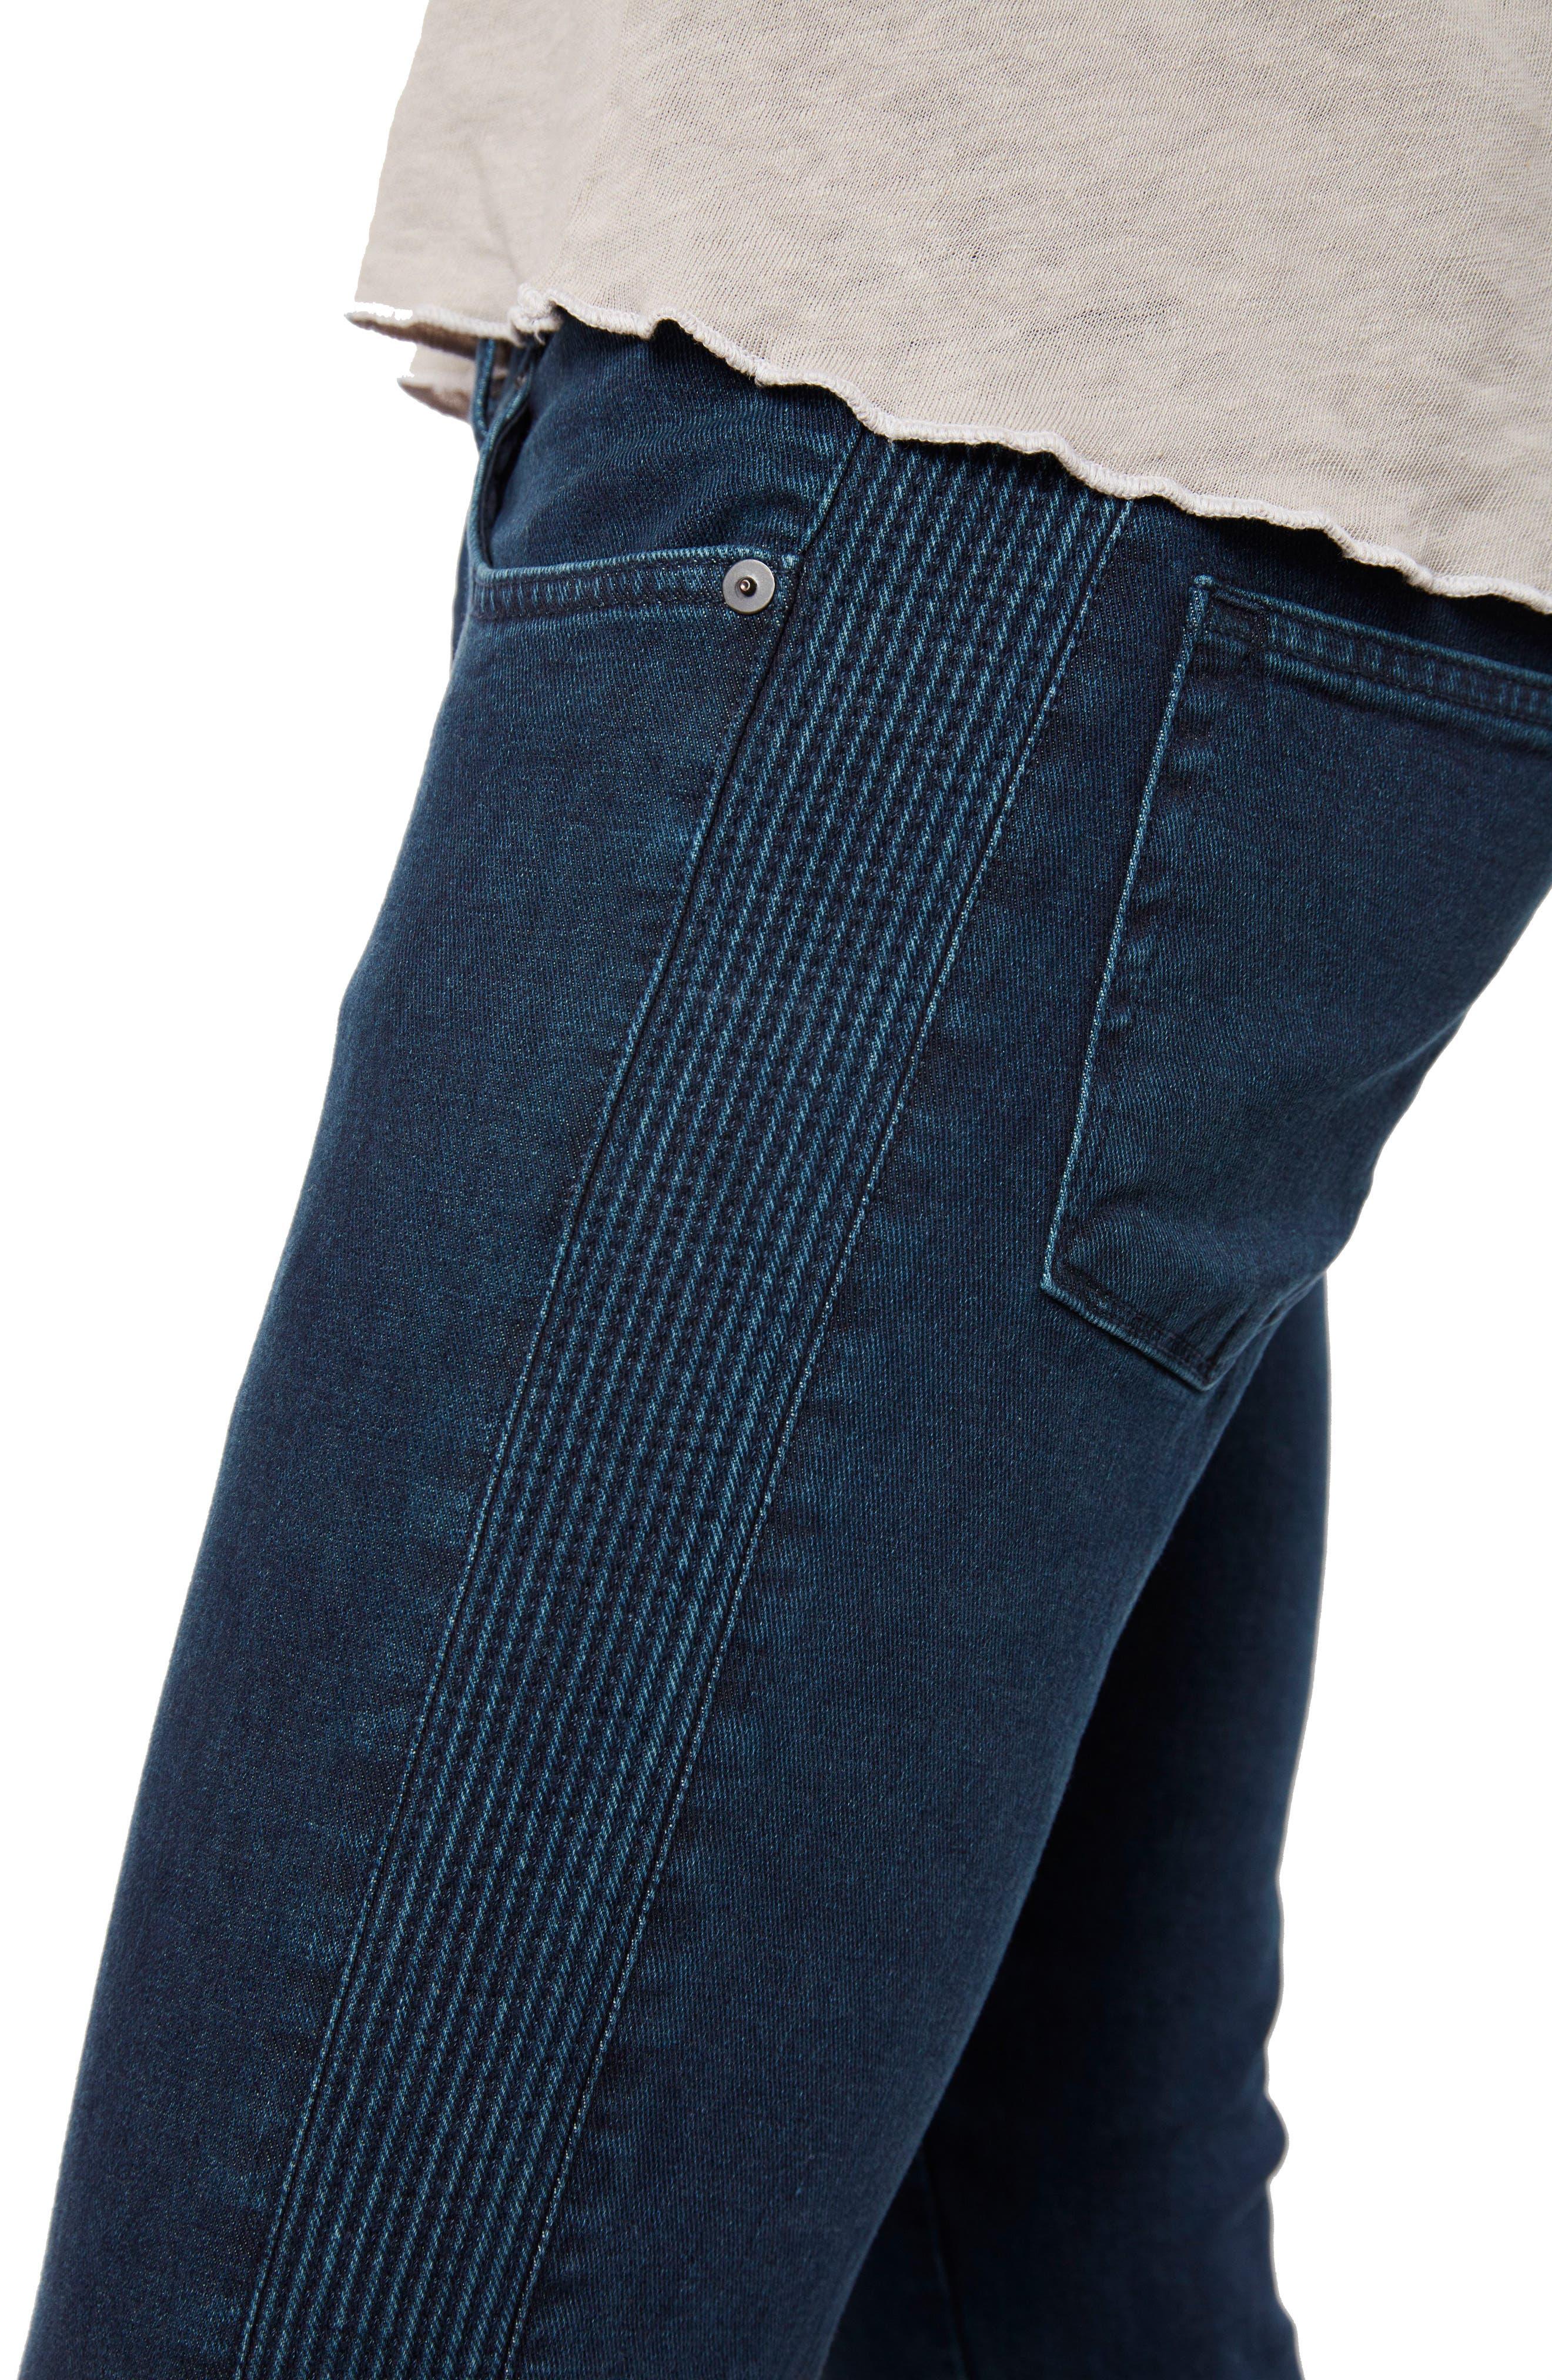 Moto Skinny Fit Jeans,                             Alternate thumbnail 4, color,                             403